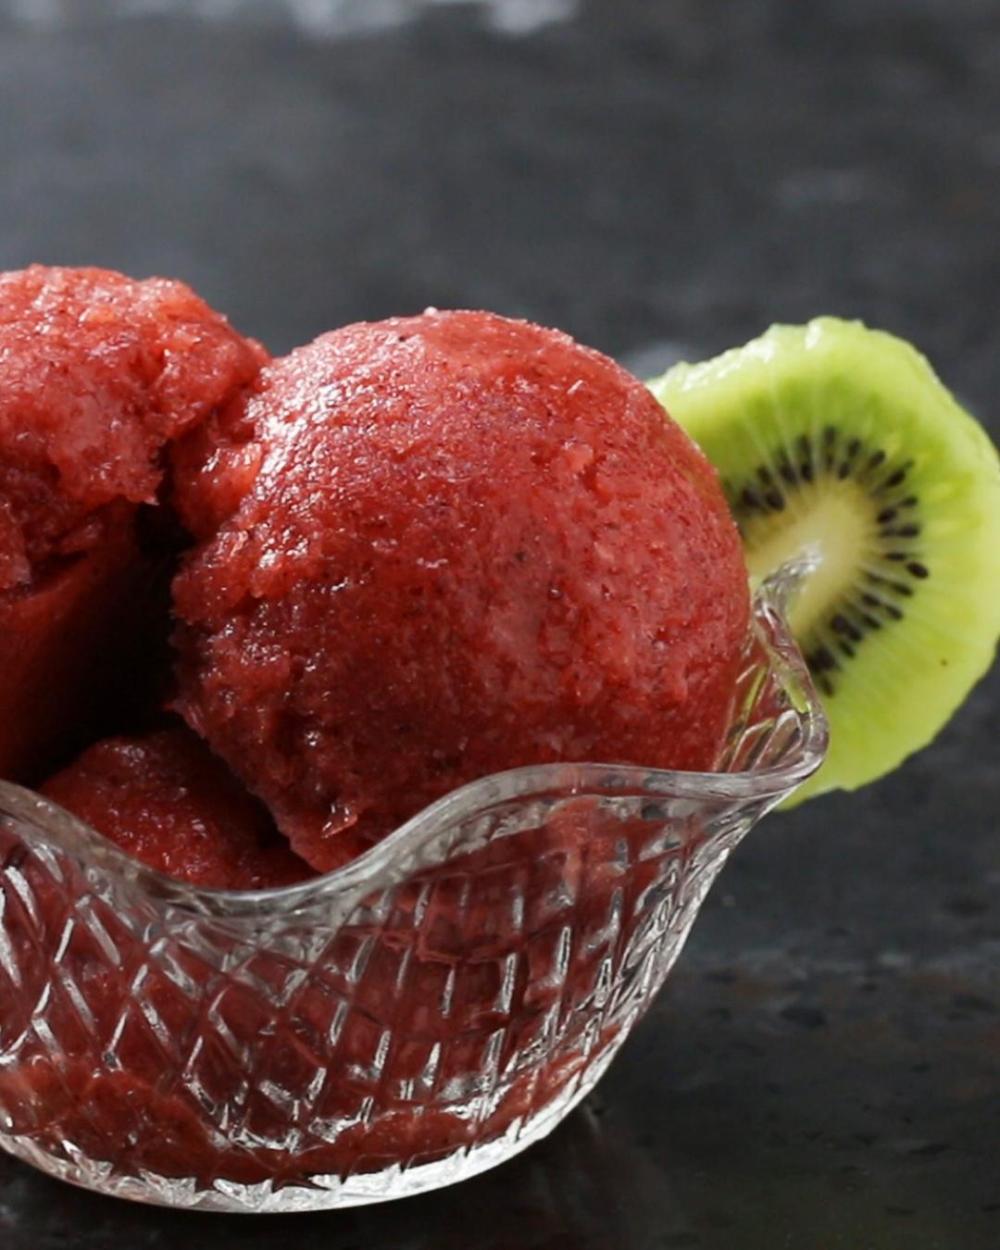 Raspberry Lemonade Sorbet #raspberrylemonade